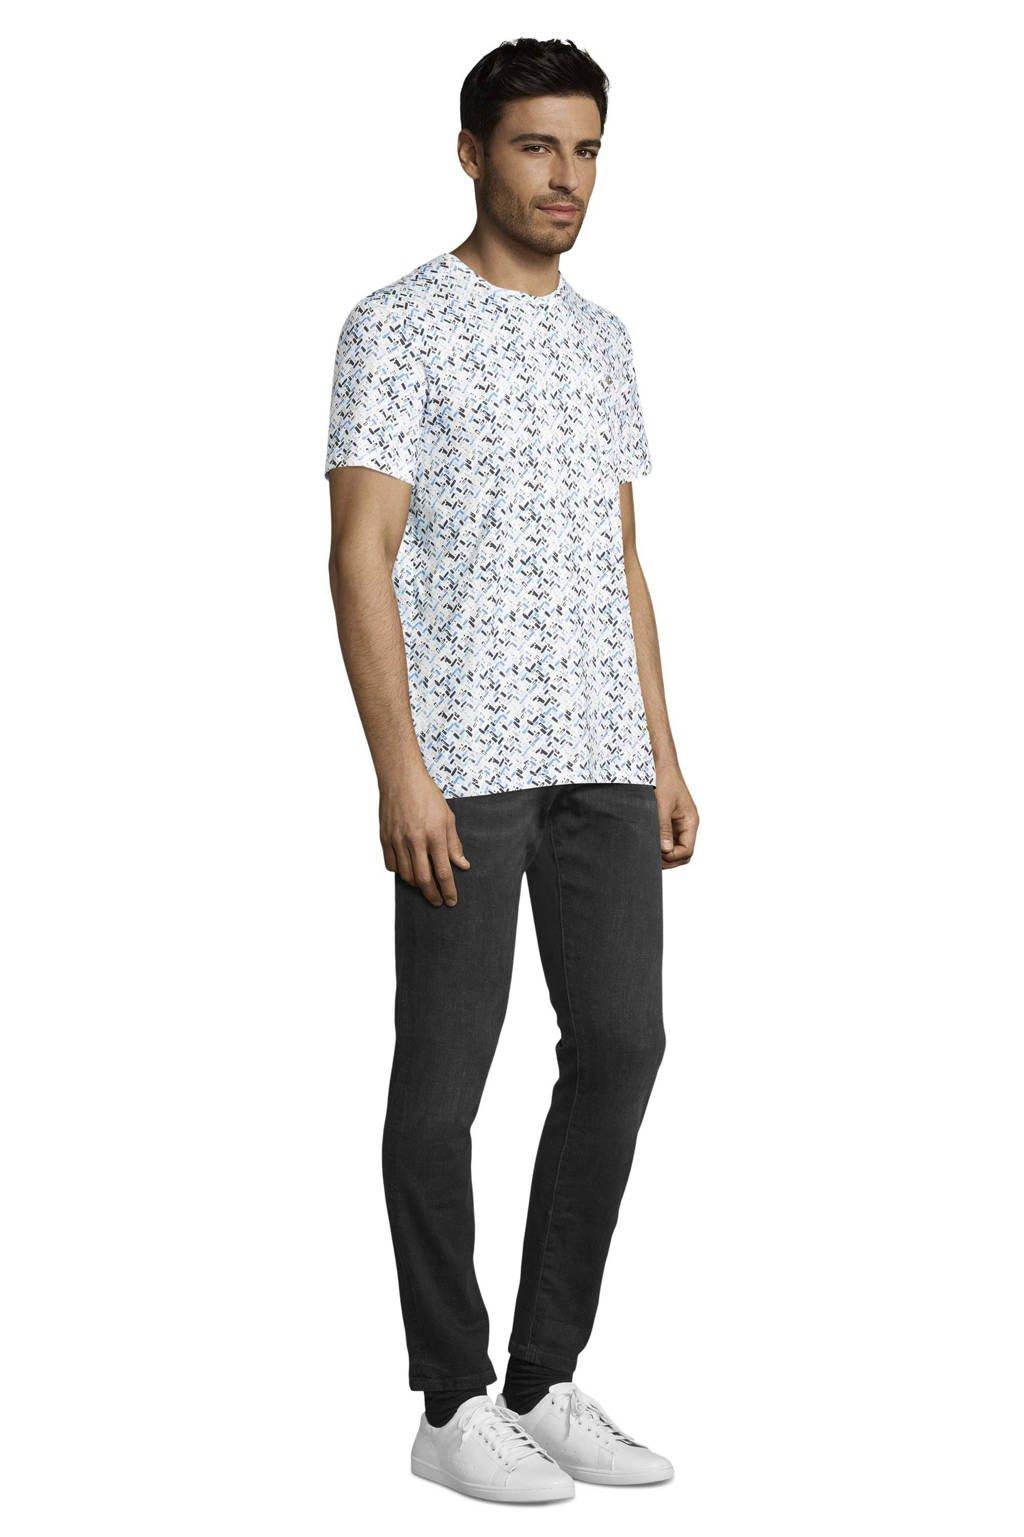 Tom Tailor T-shirt met all over print wit/blauw, Wit/blauw